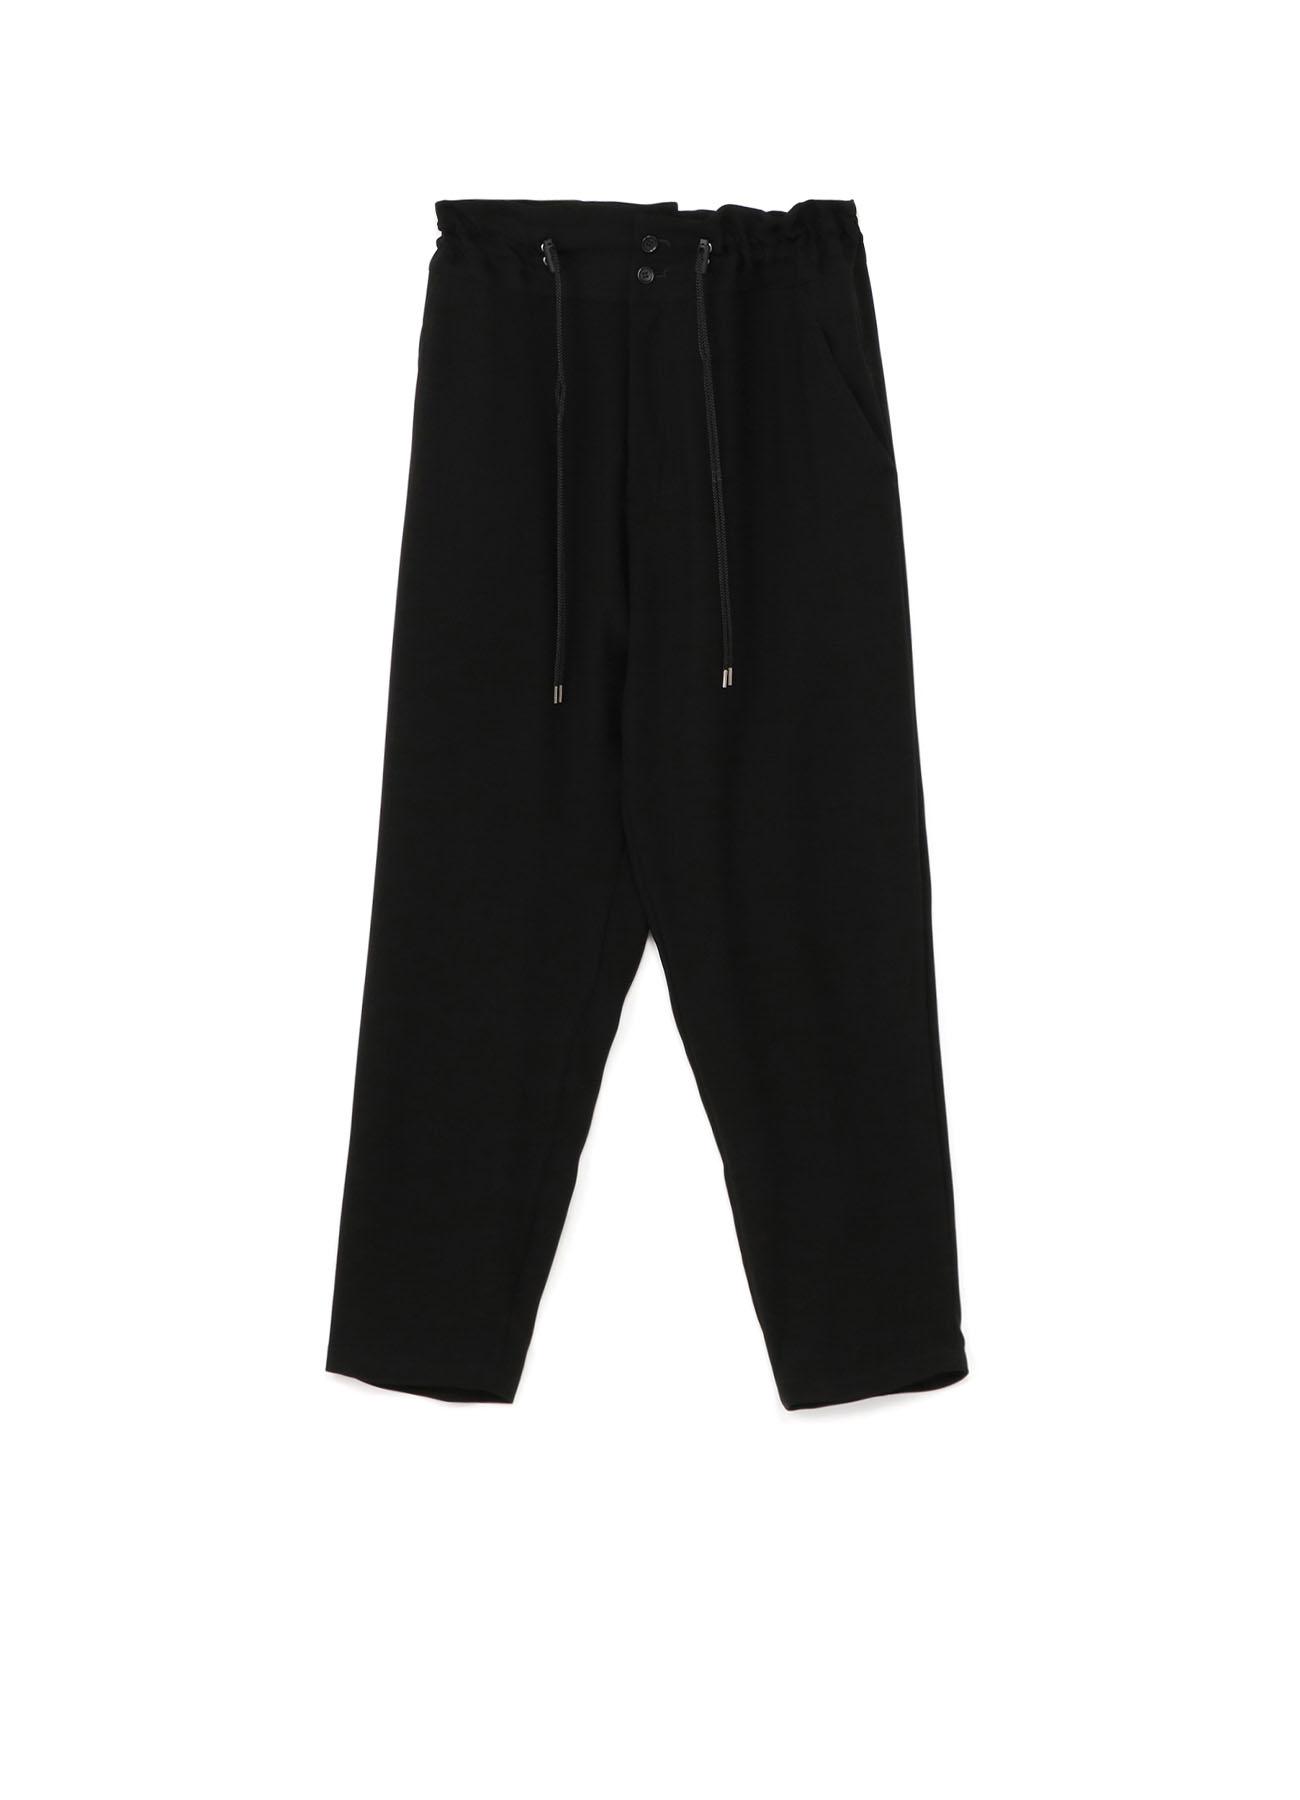 Double Satin Drawstring Pants